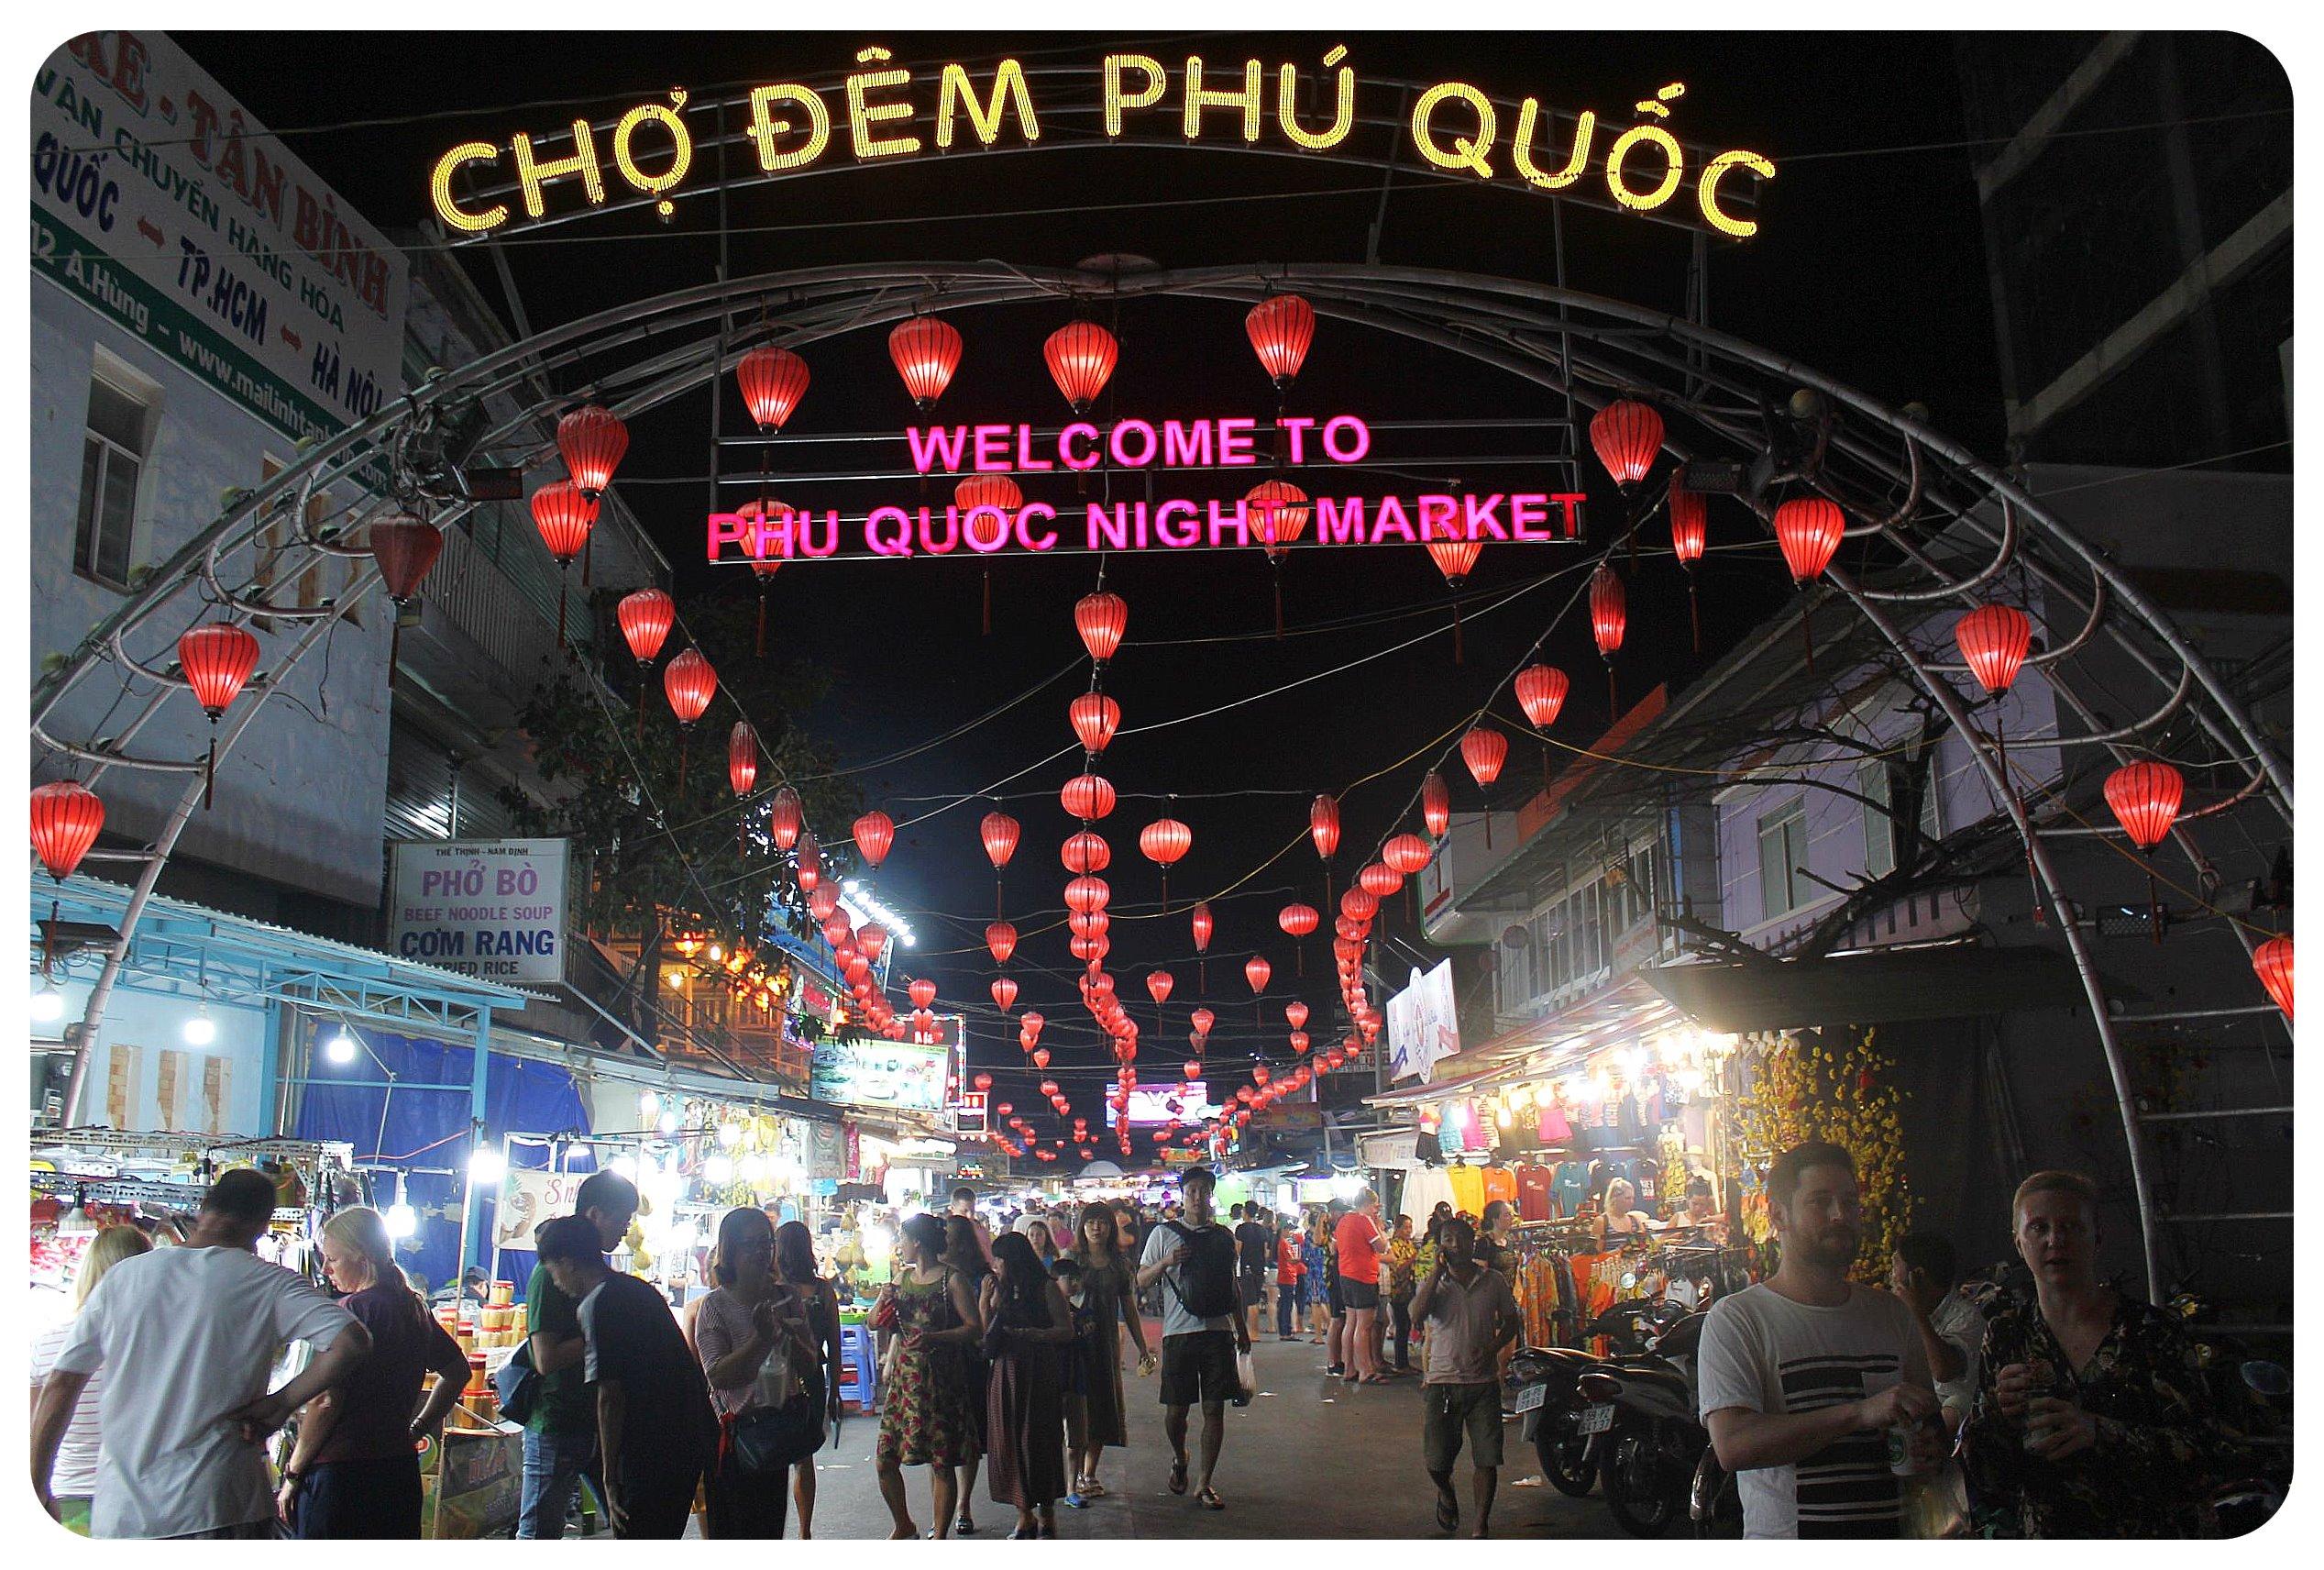 phu quoc night market cho dem